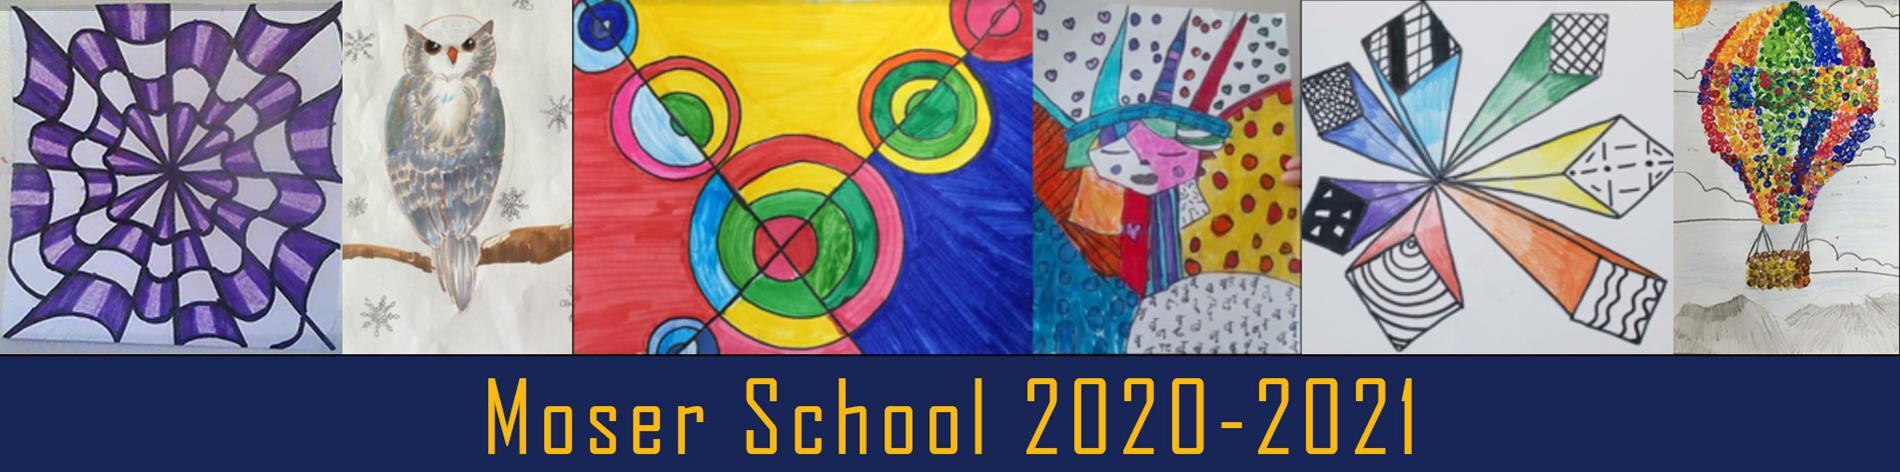 Artwork from Moser School